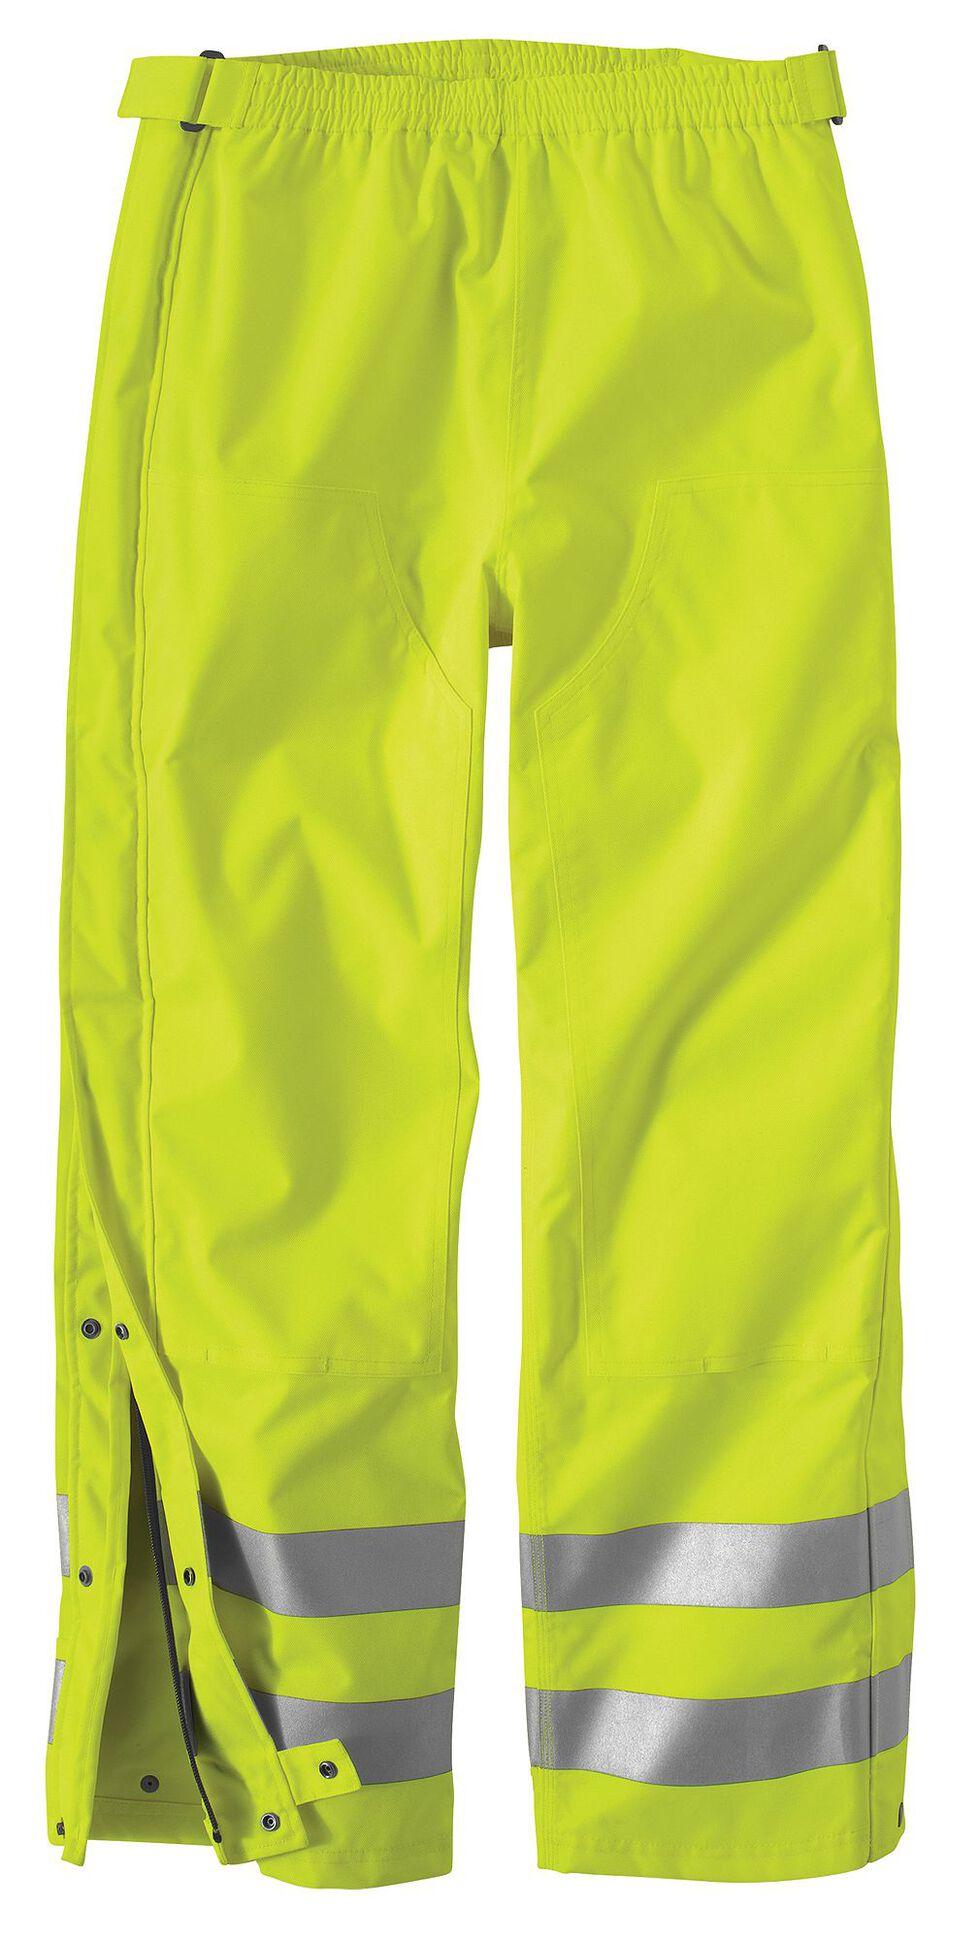 Carhartt High-Visibility Class E Waterproof Pants - Big & Tall, Lime, hi-res